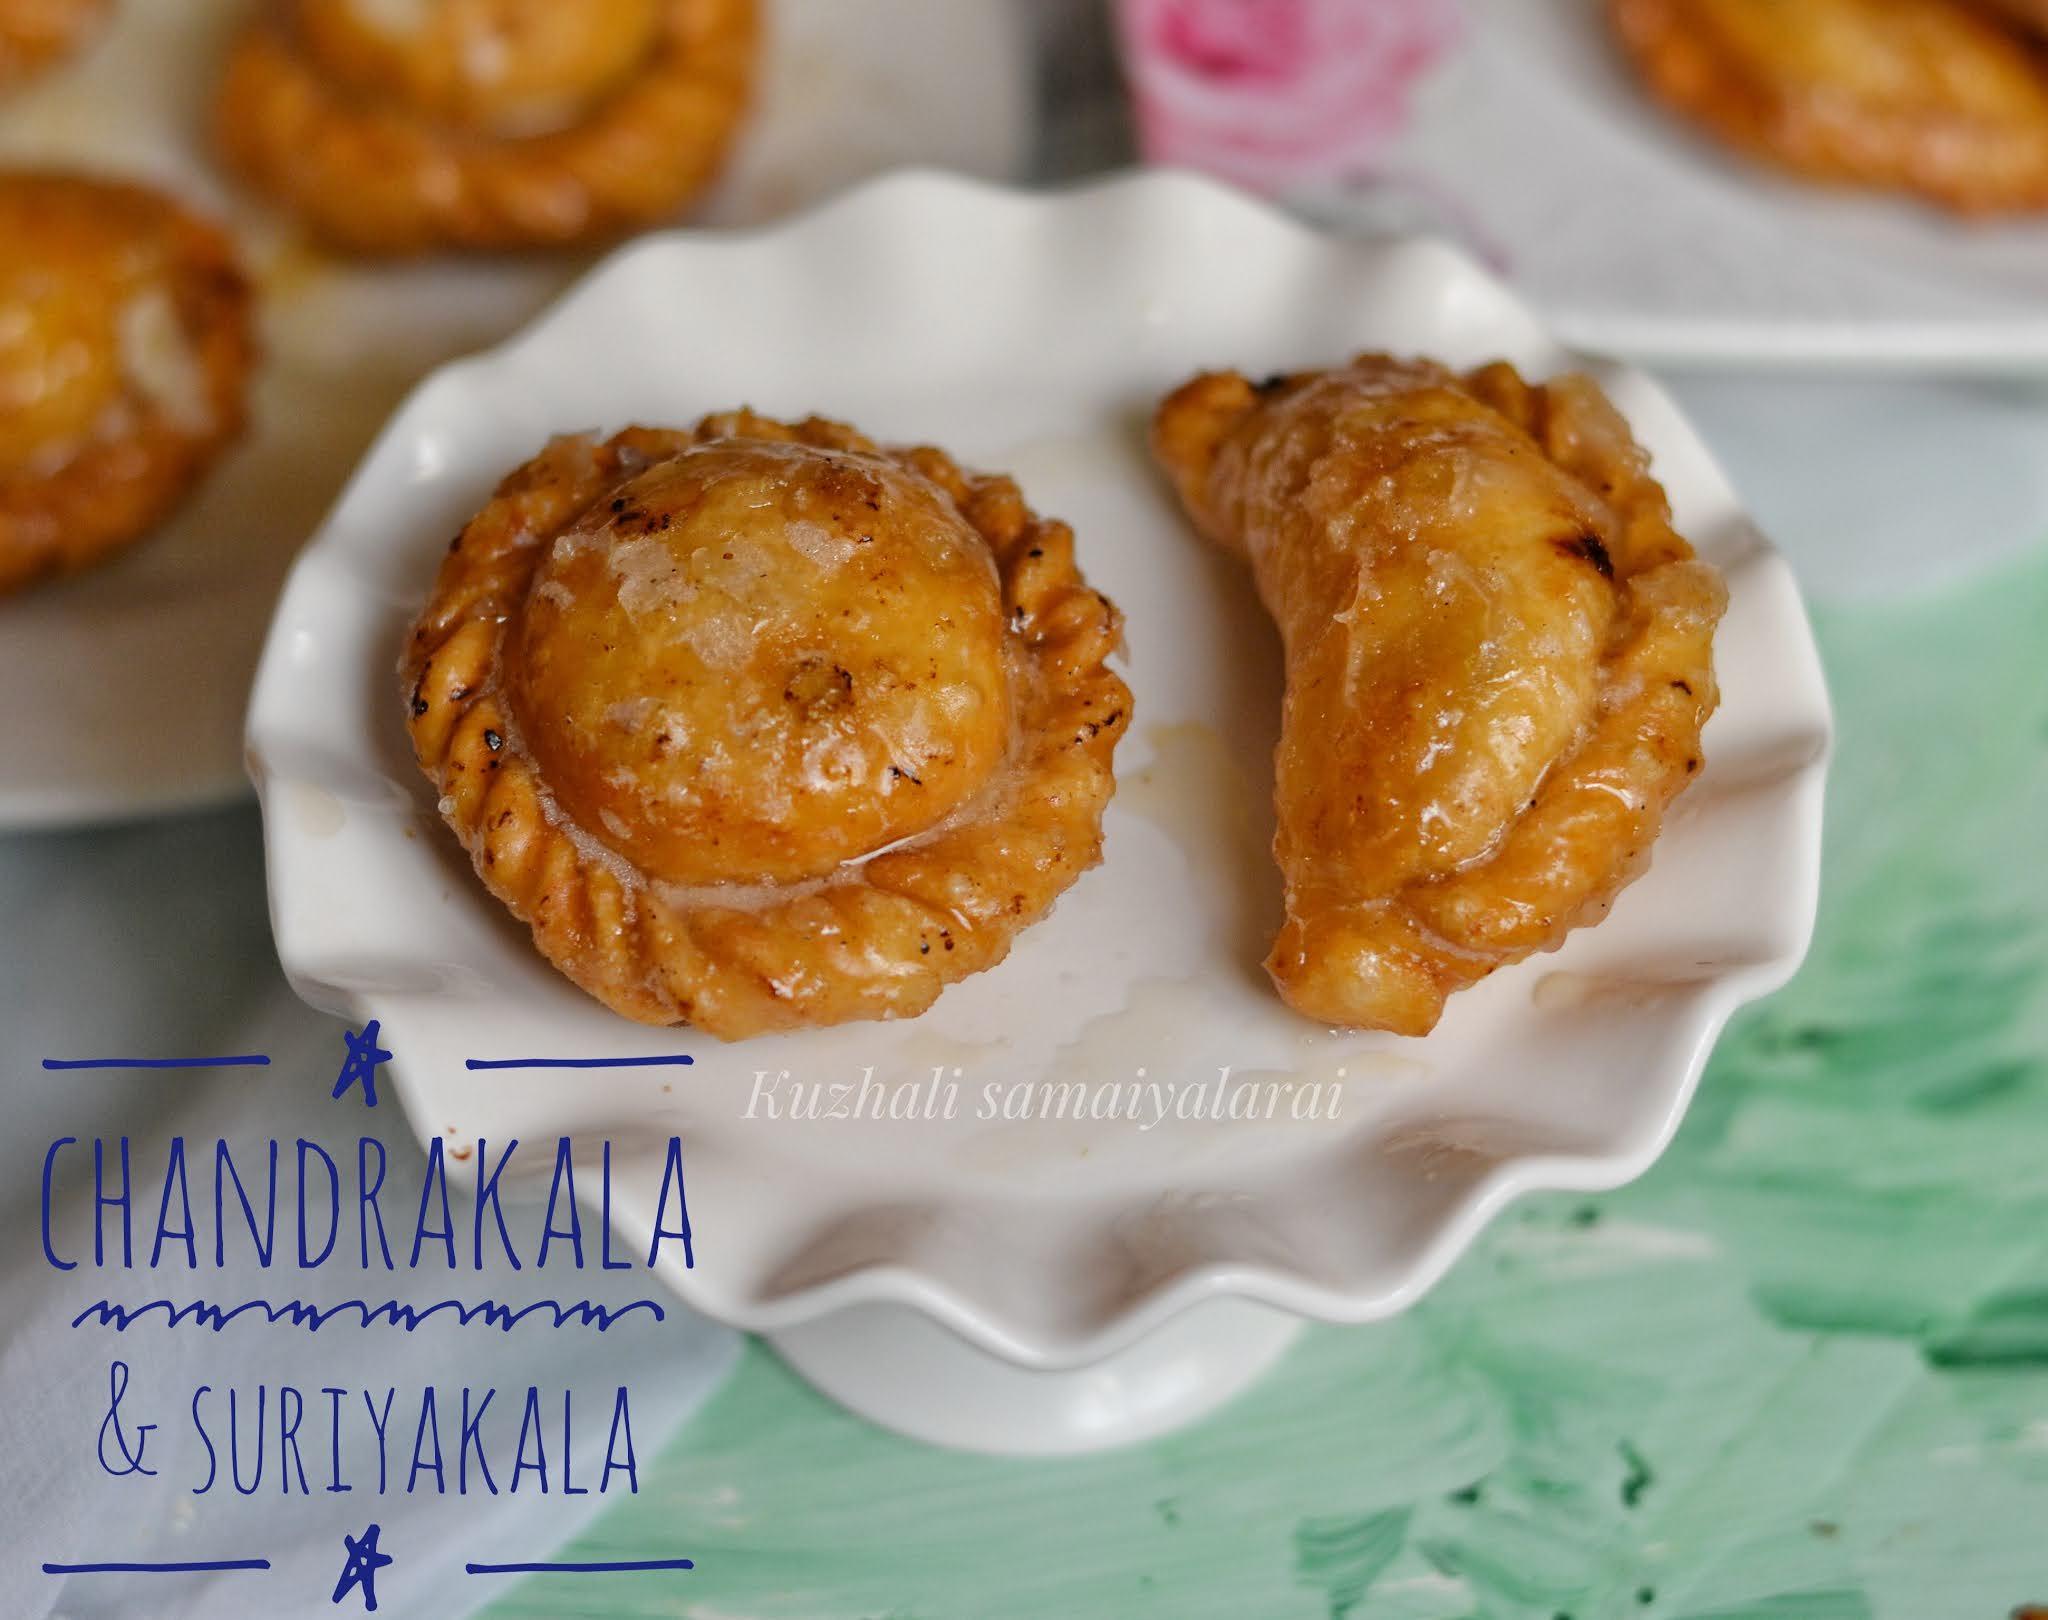 https://www.kuzhalisamaiyalarai.in/2020/11/chandrakala-and-suriyakala-sweet-recipe.html